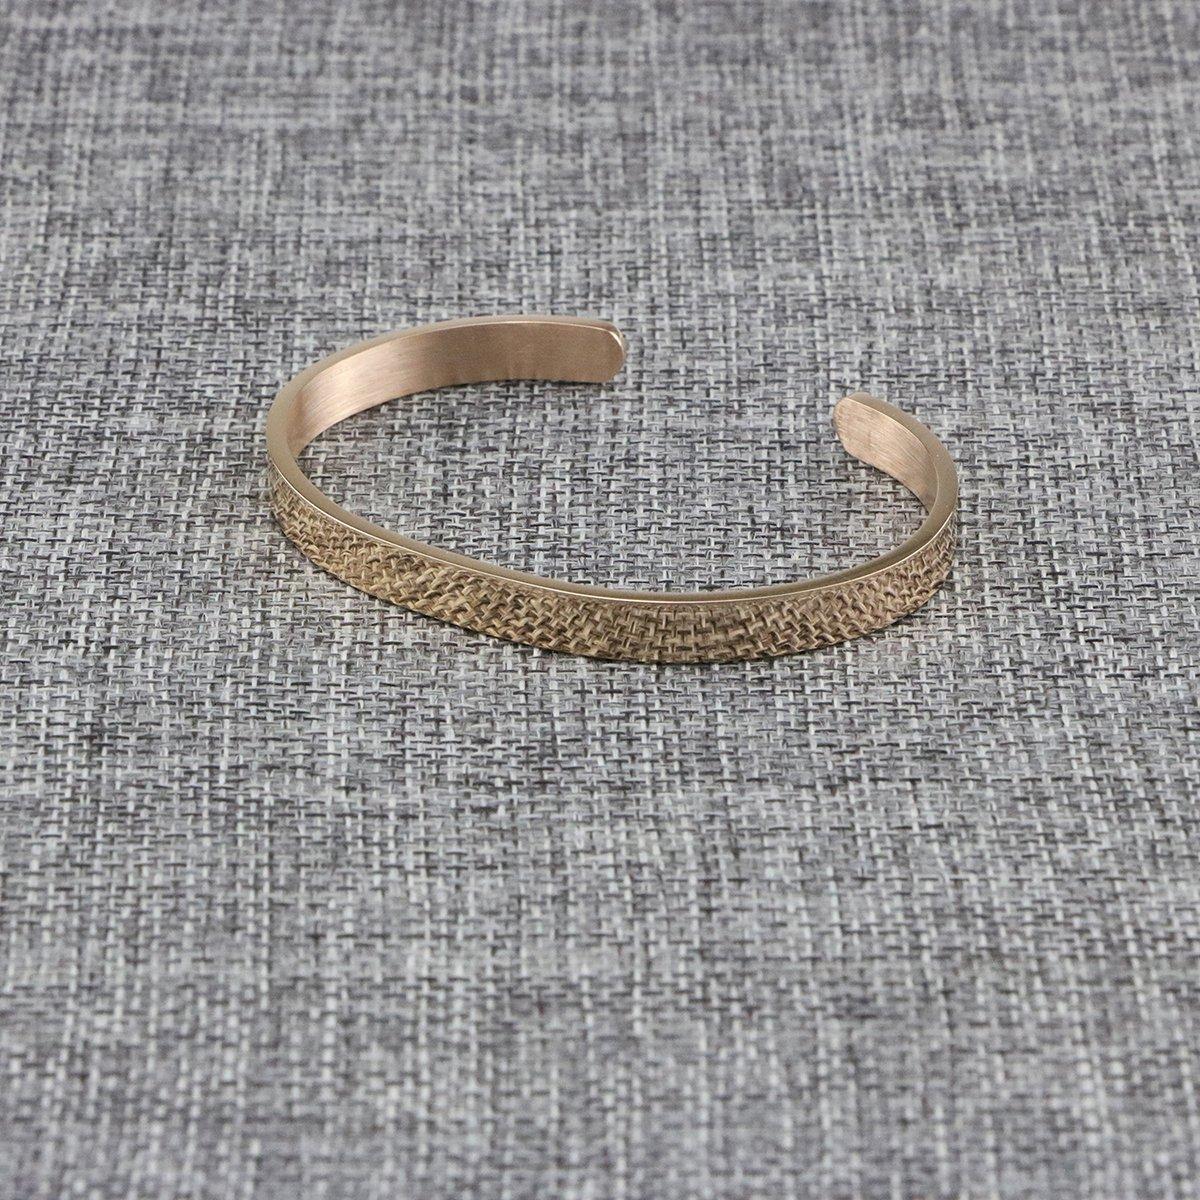 Joycuff Blank Cuff Bracelet Stainless Steel Jewelry Minimalist Simple Open Bangle